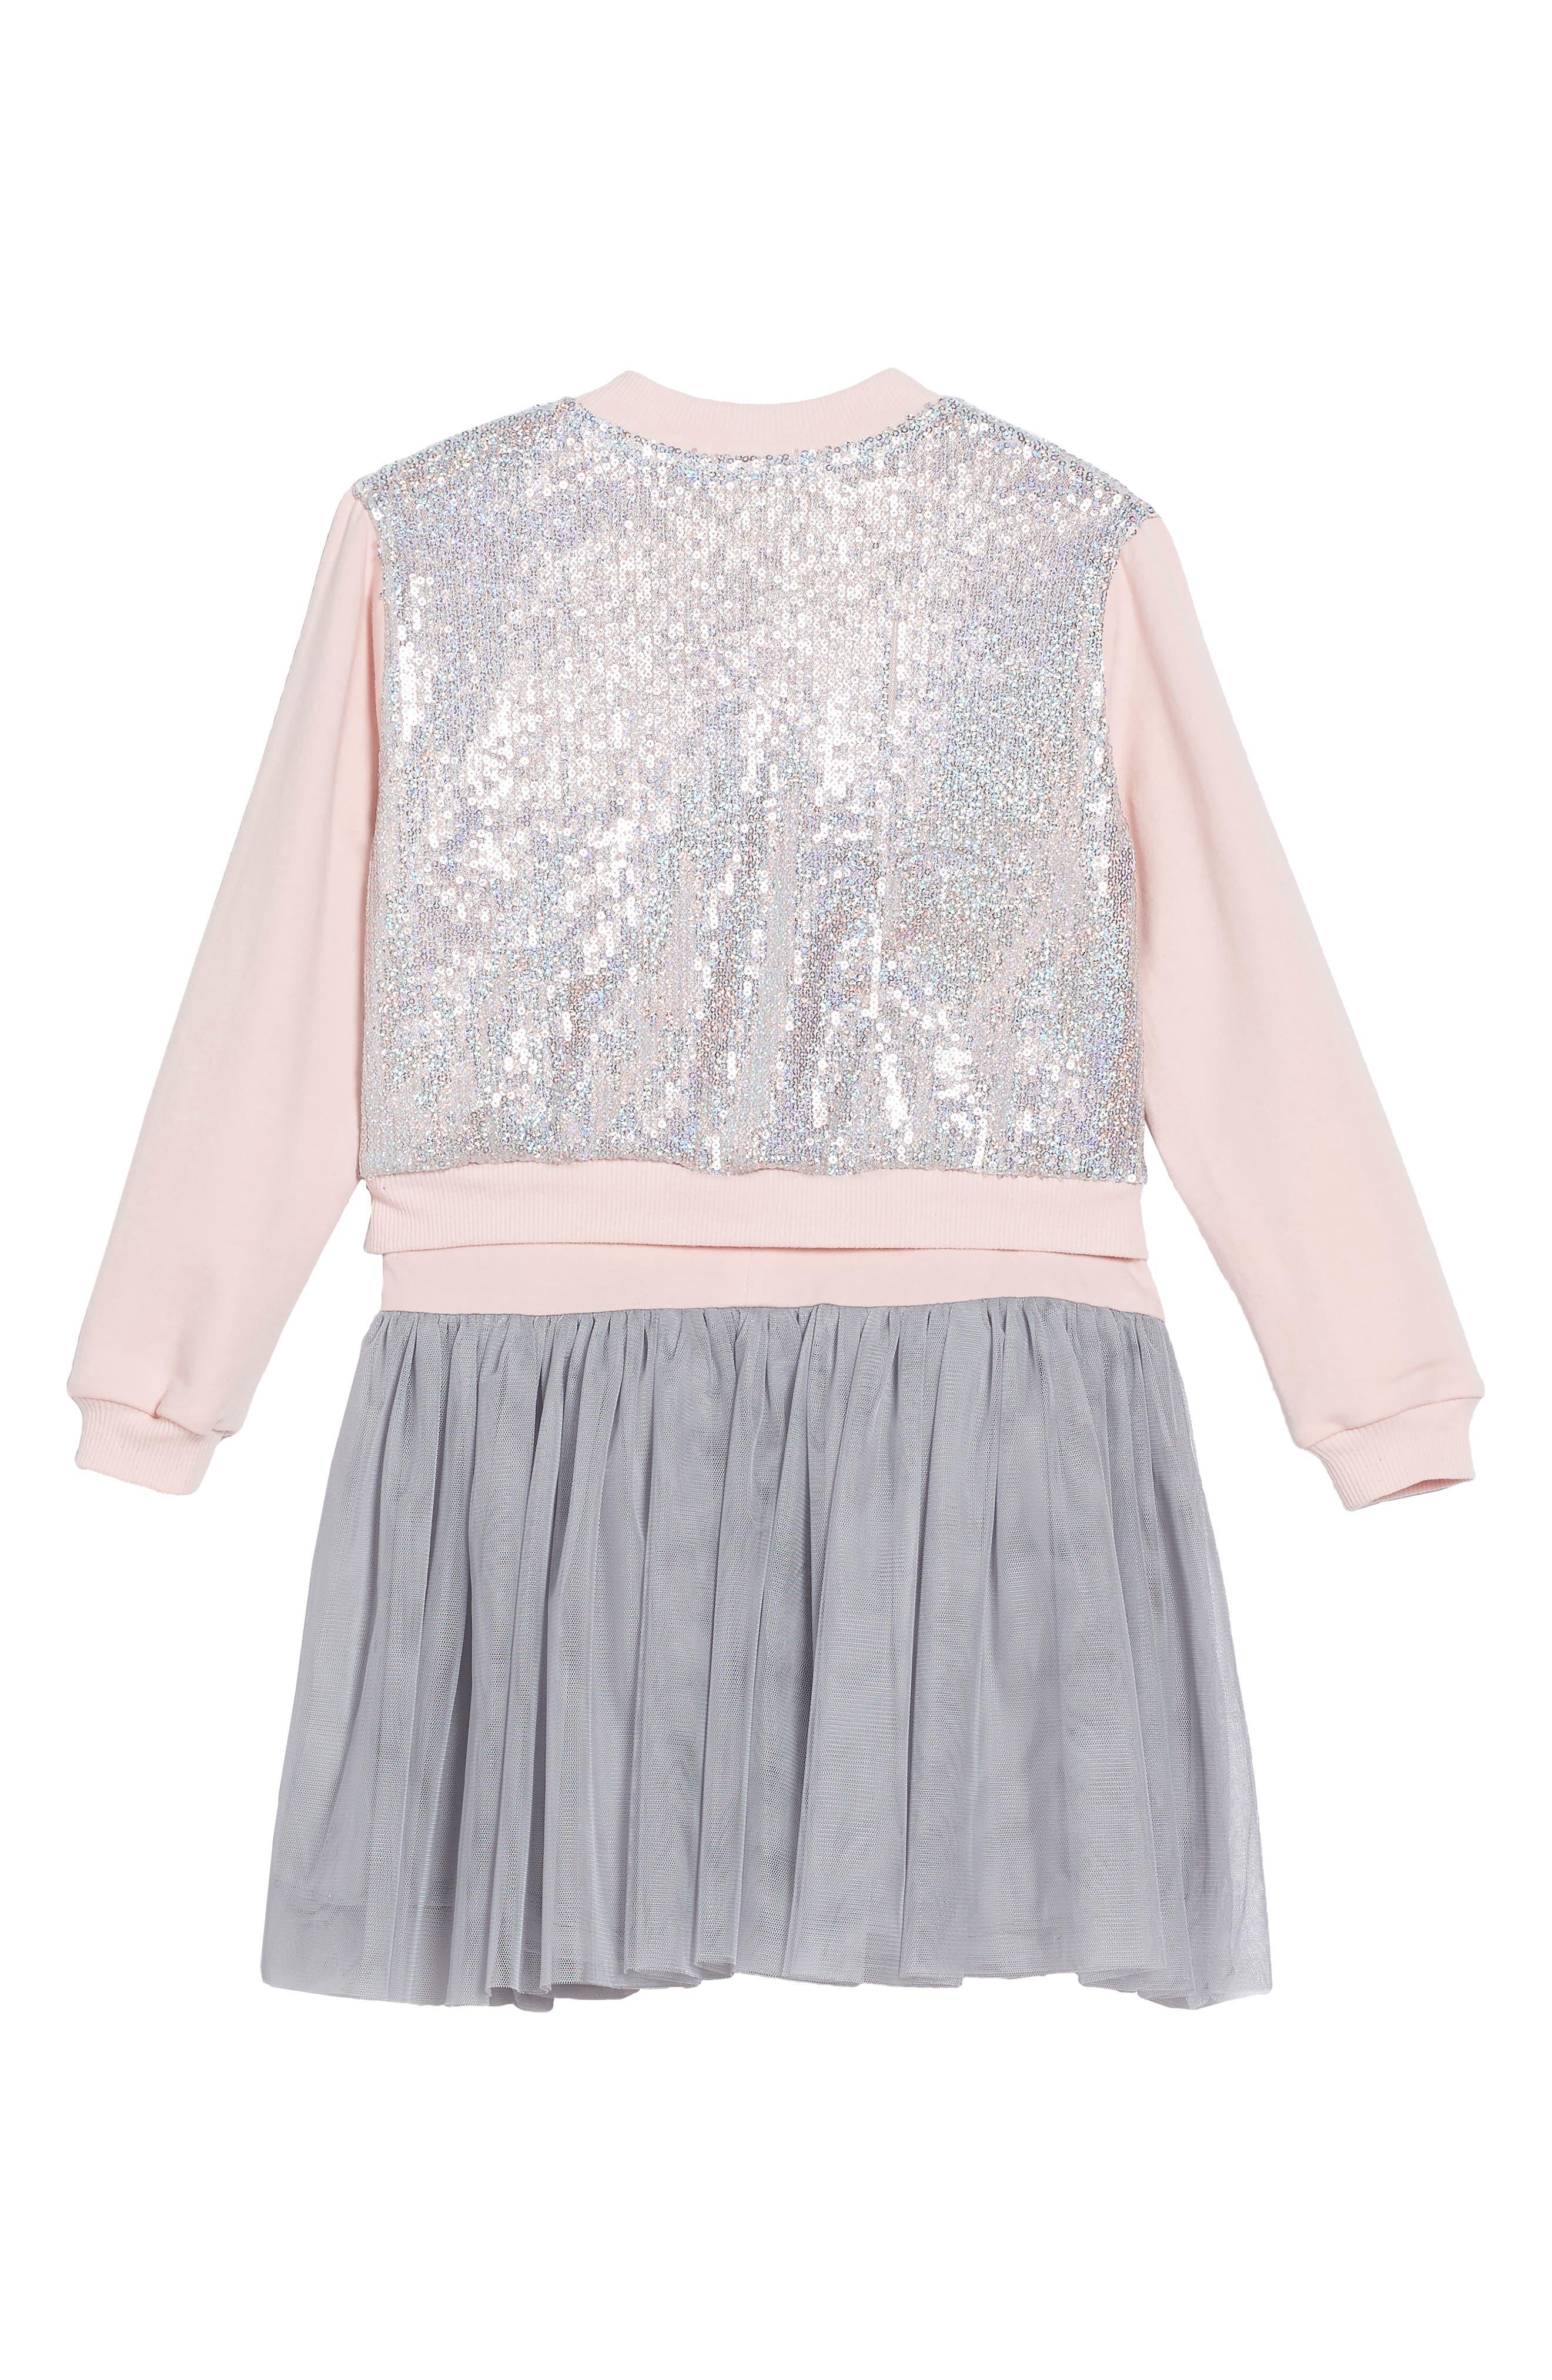 Alternate Image 2  - Pippa & Julie Tank Dress & Sequin Bomber Jacket Set (Toddler Girls, Little Girls & Big Girls)